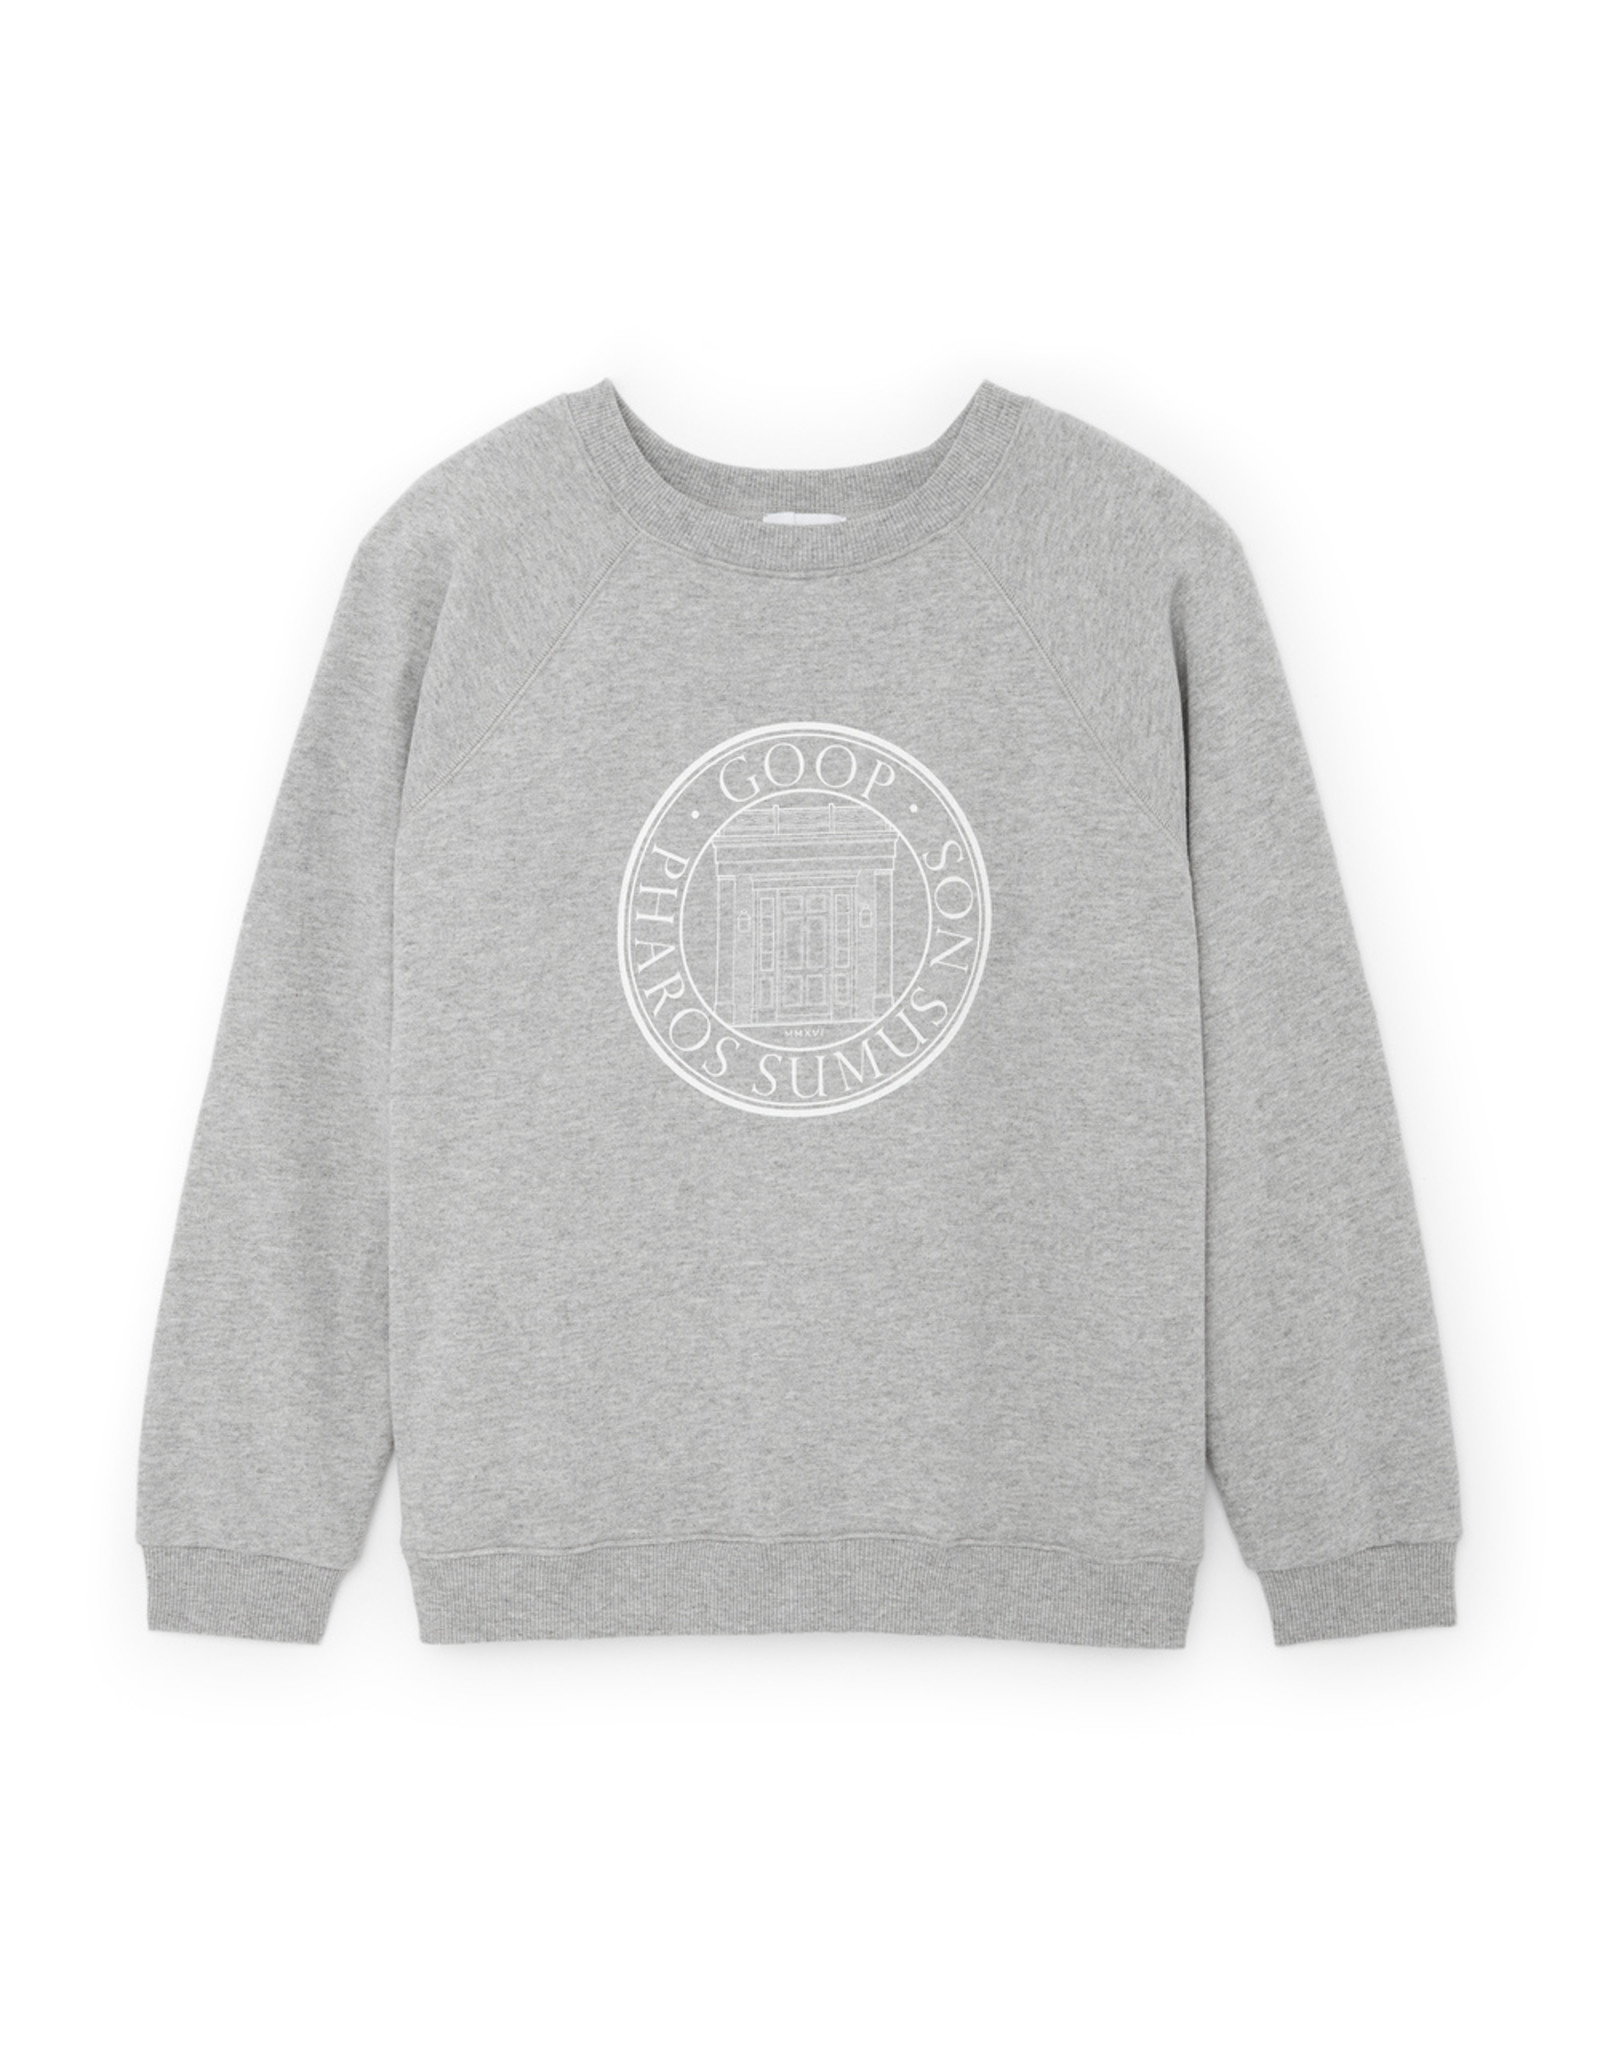 G. Label G. Label goop University Sweatshirt (Color: Grey Heather, Size: S)